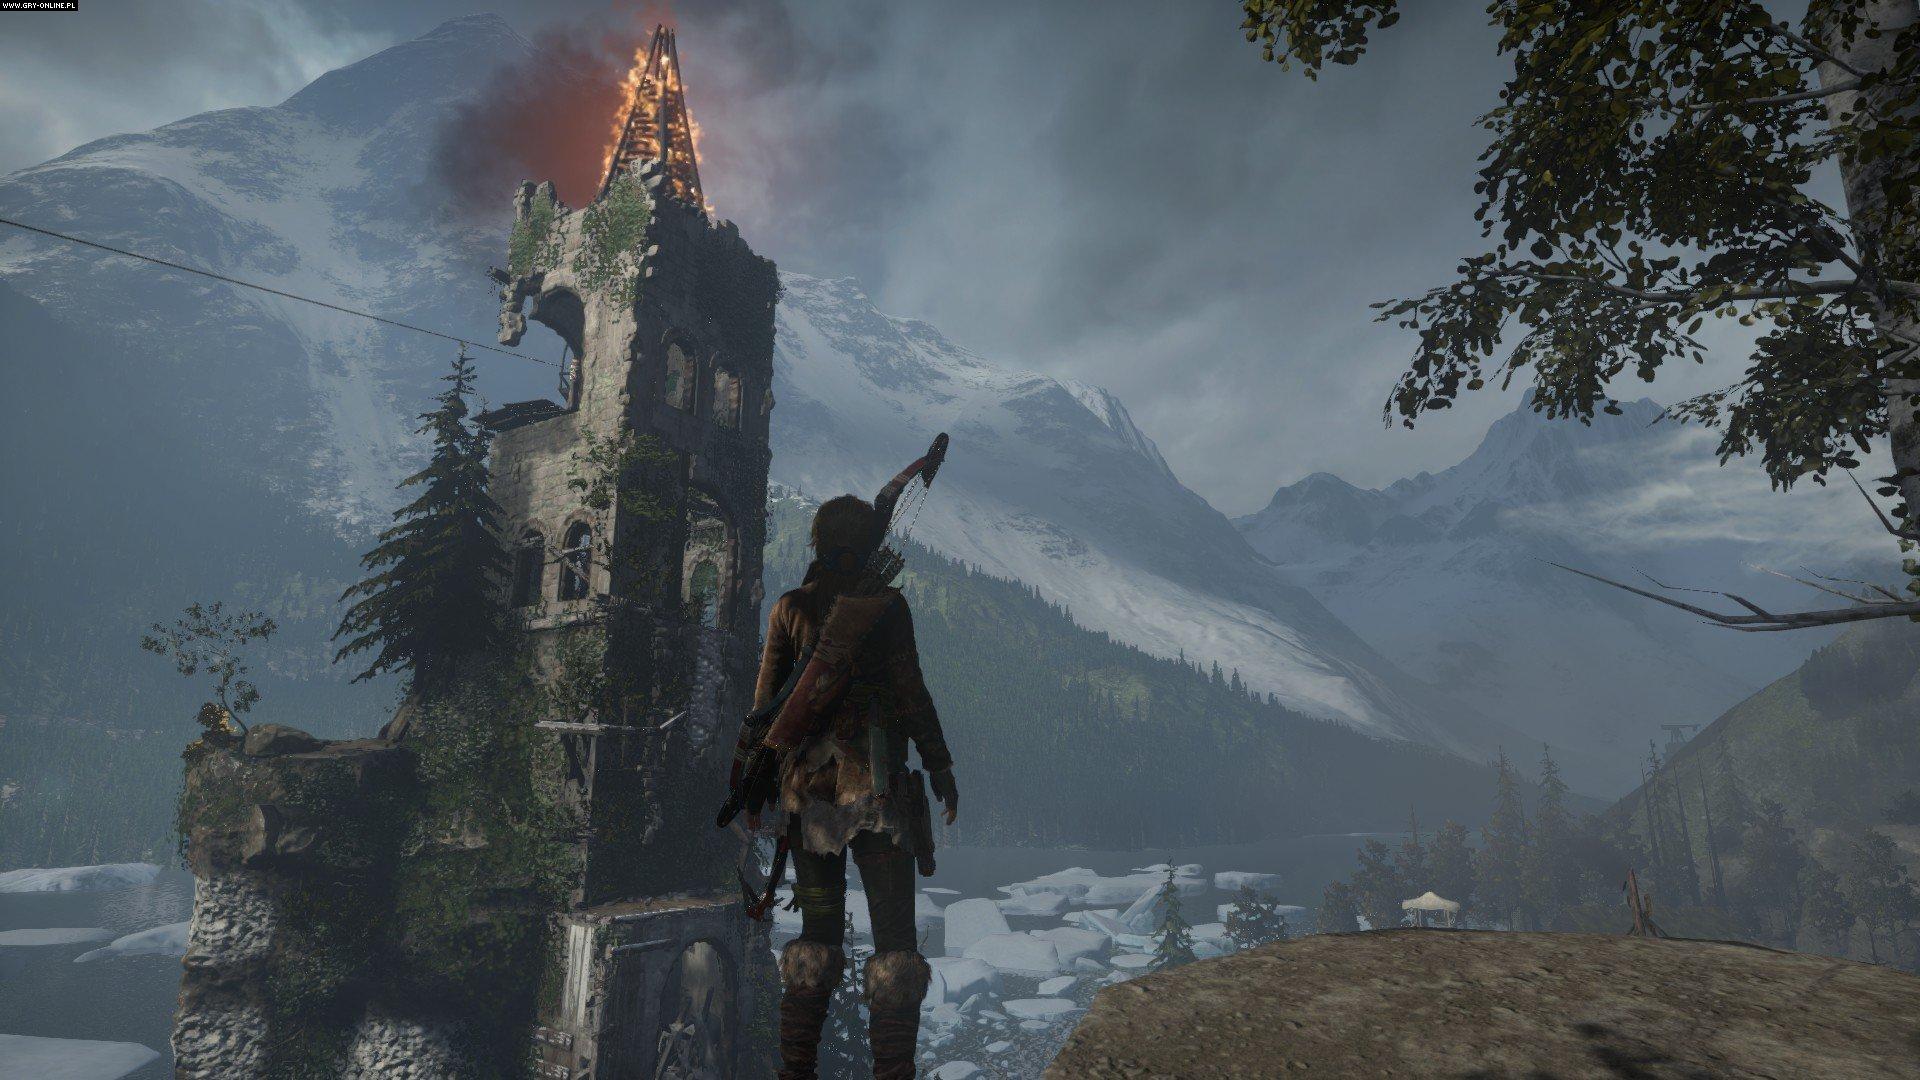 Rise of the Tomb Raider PC, XONE Games Image 42/126, Crystal Dynamics, Square-Enix / Eidos